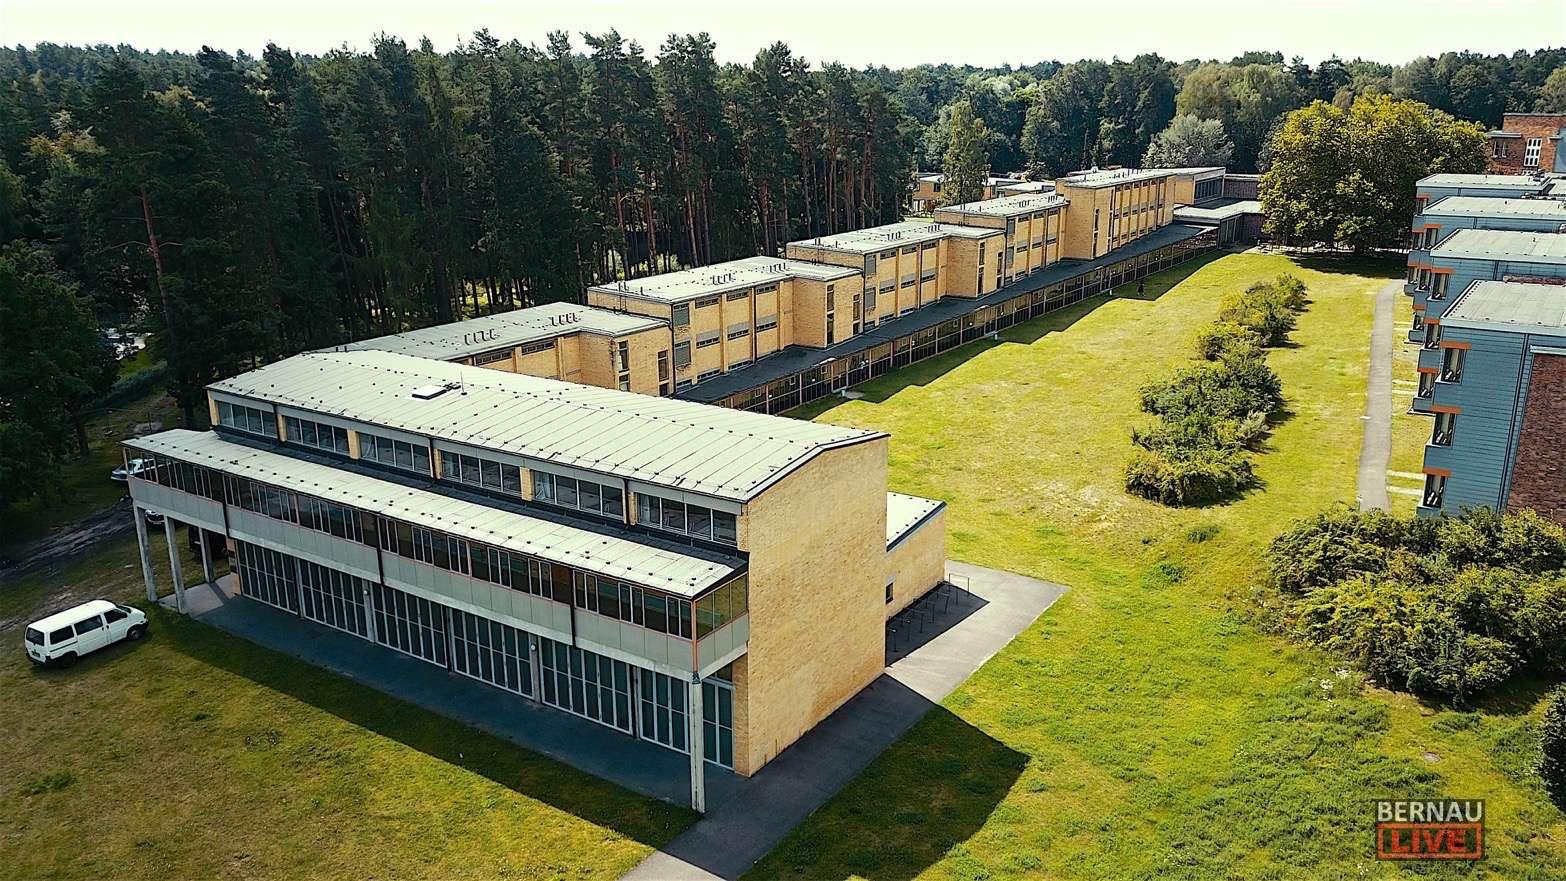 Bauhaus-Denkmal Bernau - Betonarbeiten am UNESCO-Weltkulturerbe